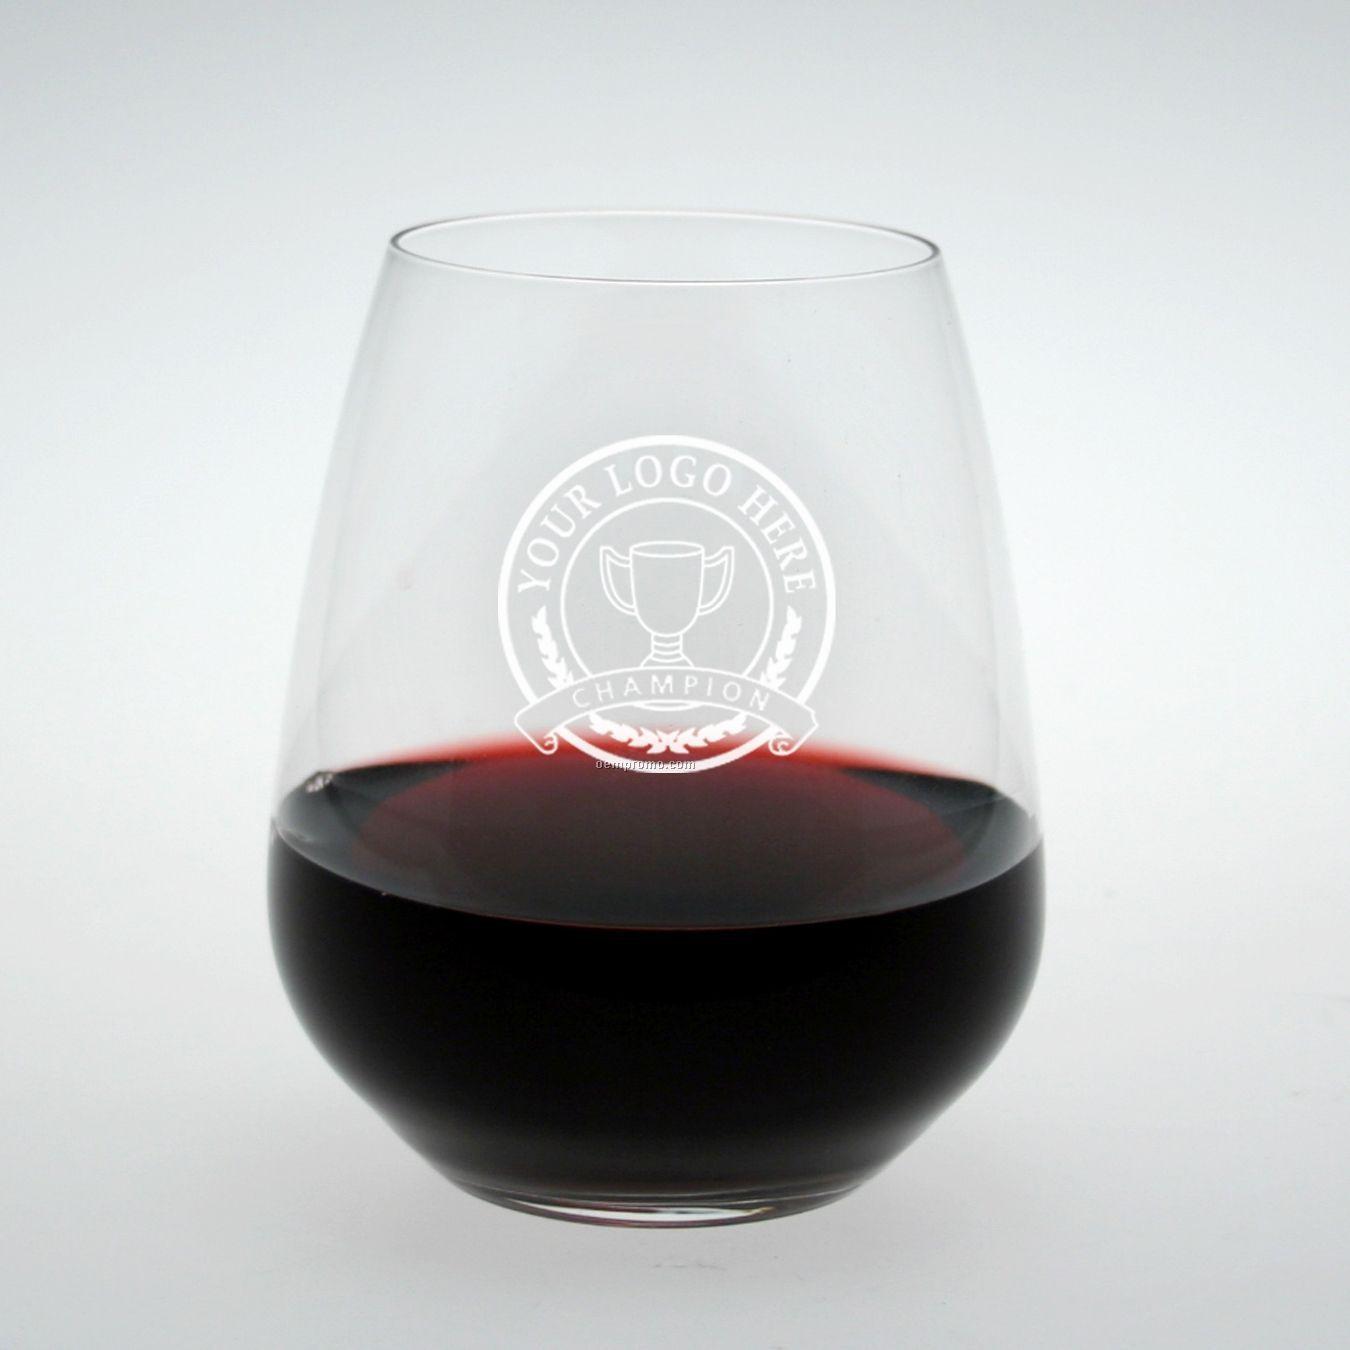 Studio Stemless Cabernet/ Merlot Glass (Set Of 2 - Deep Etch)